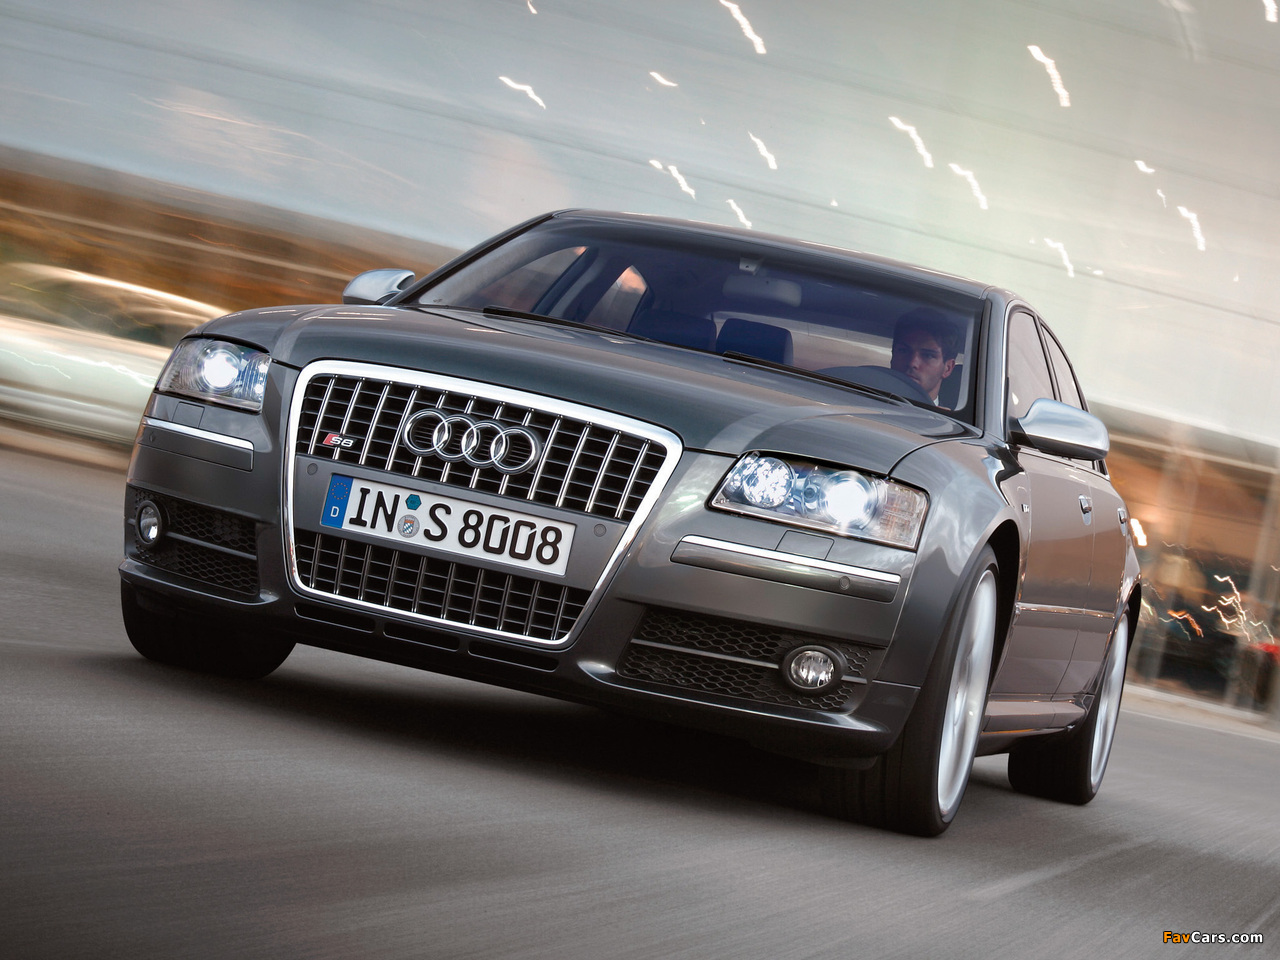 Audi S8 D3 2005 08 Wallpapers 1280x960